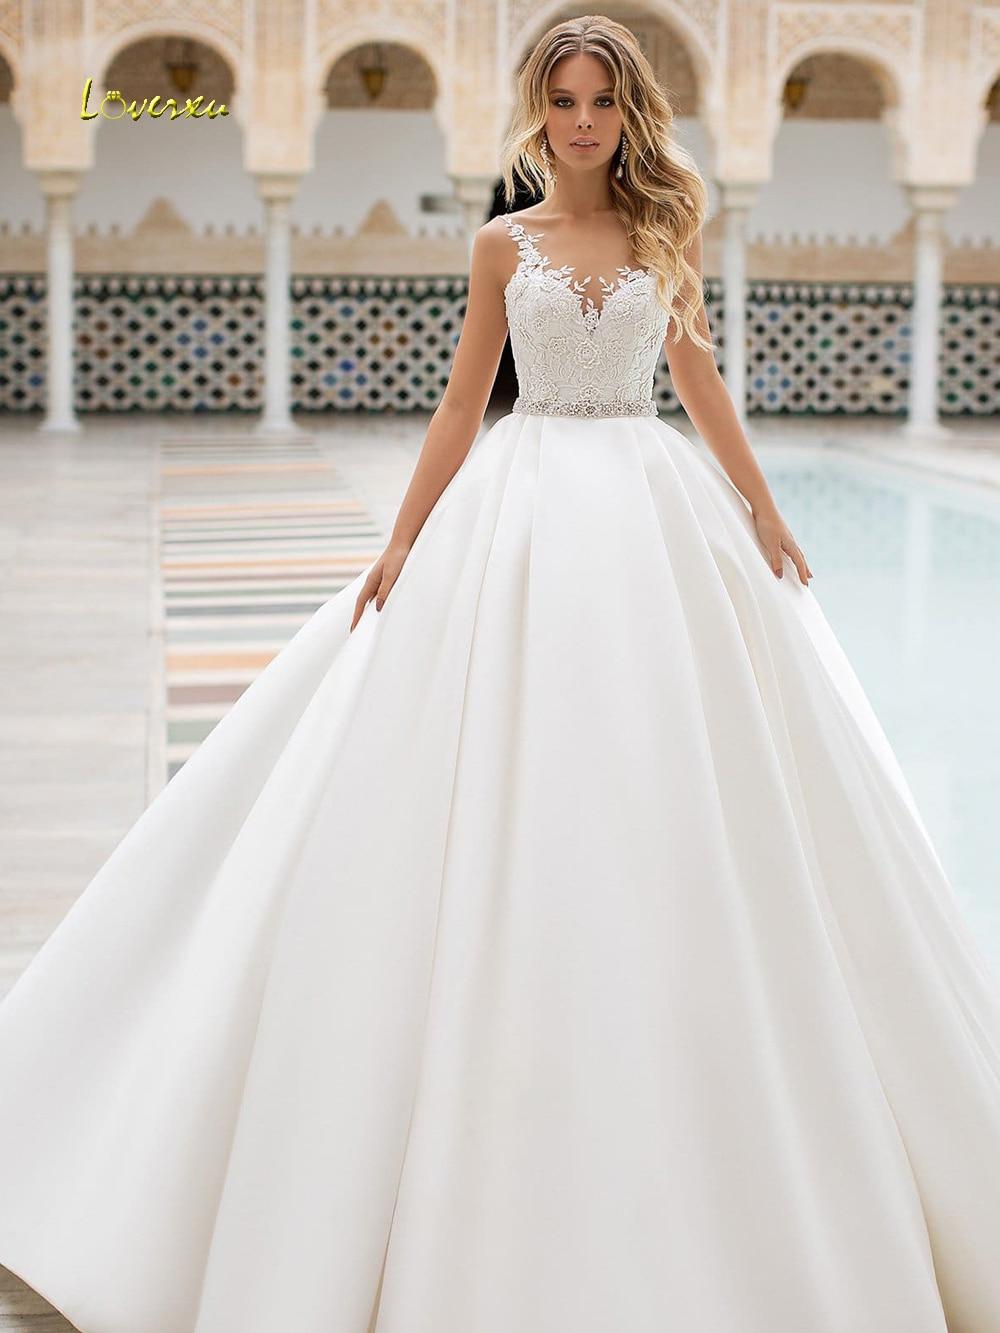 Loverxu Sexy Backless Appliques Vintage Wedding Dresses 2019 Elegant Sashes Beaded Matte Satin Court Train A